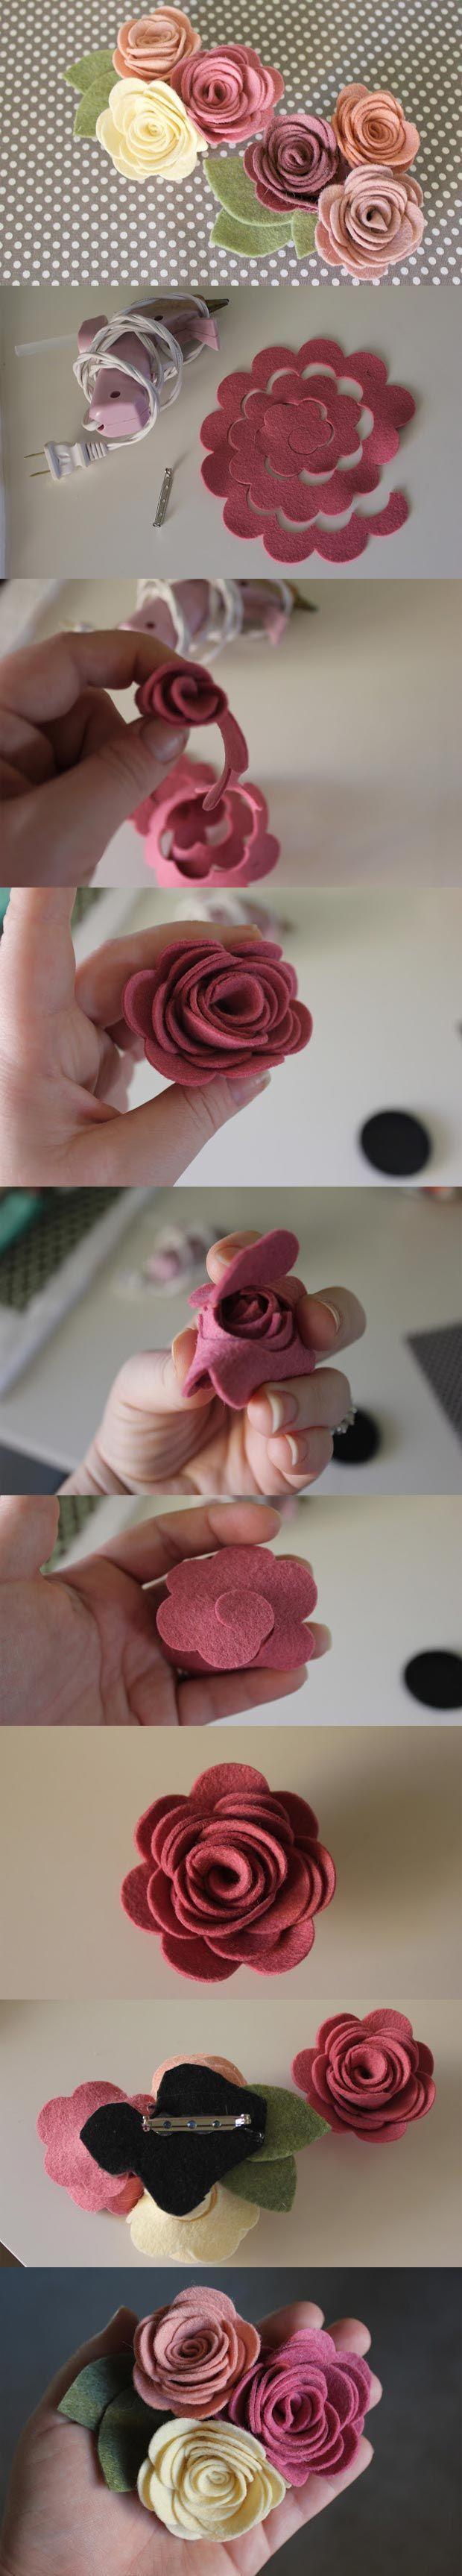 Felt Rose- so pretty! #Polymat #Felt will work greatly for making roses!